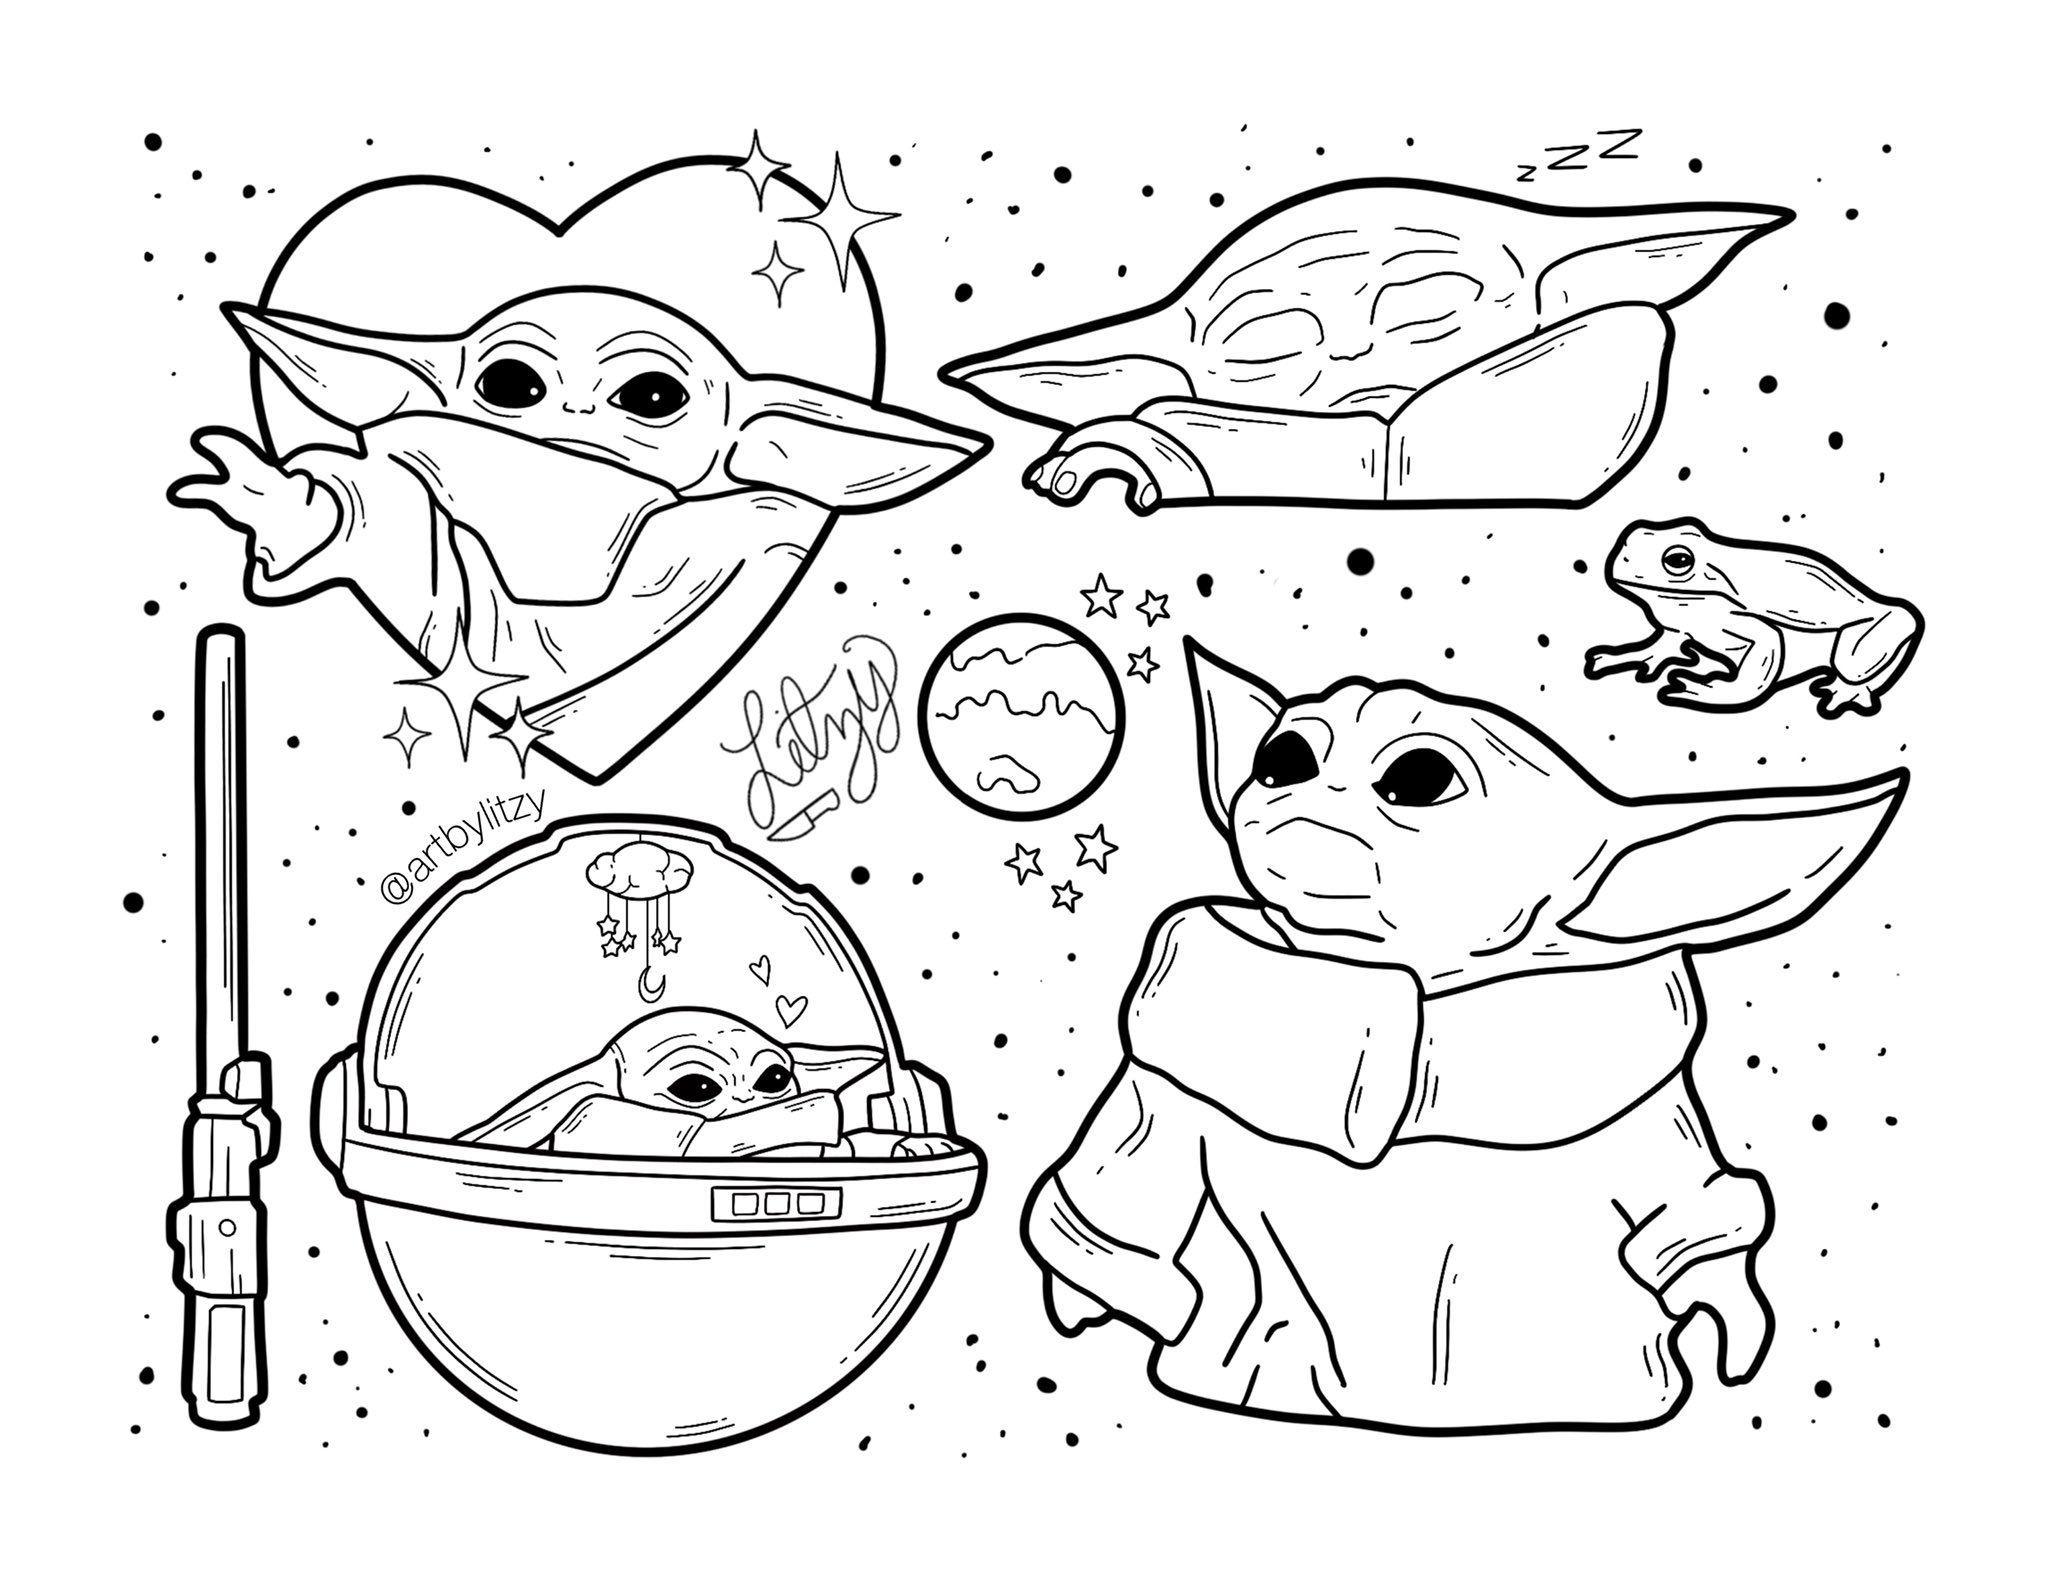 Artbylitzy On Star Wars Drawings Star Wars Tattoo Yoda Drawing